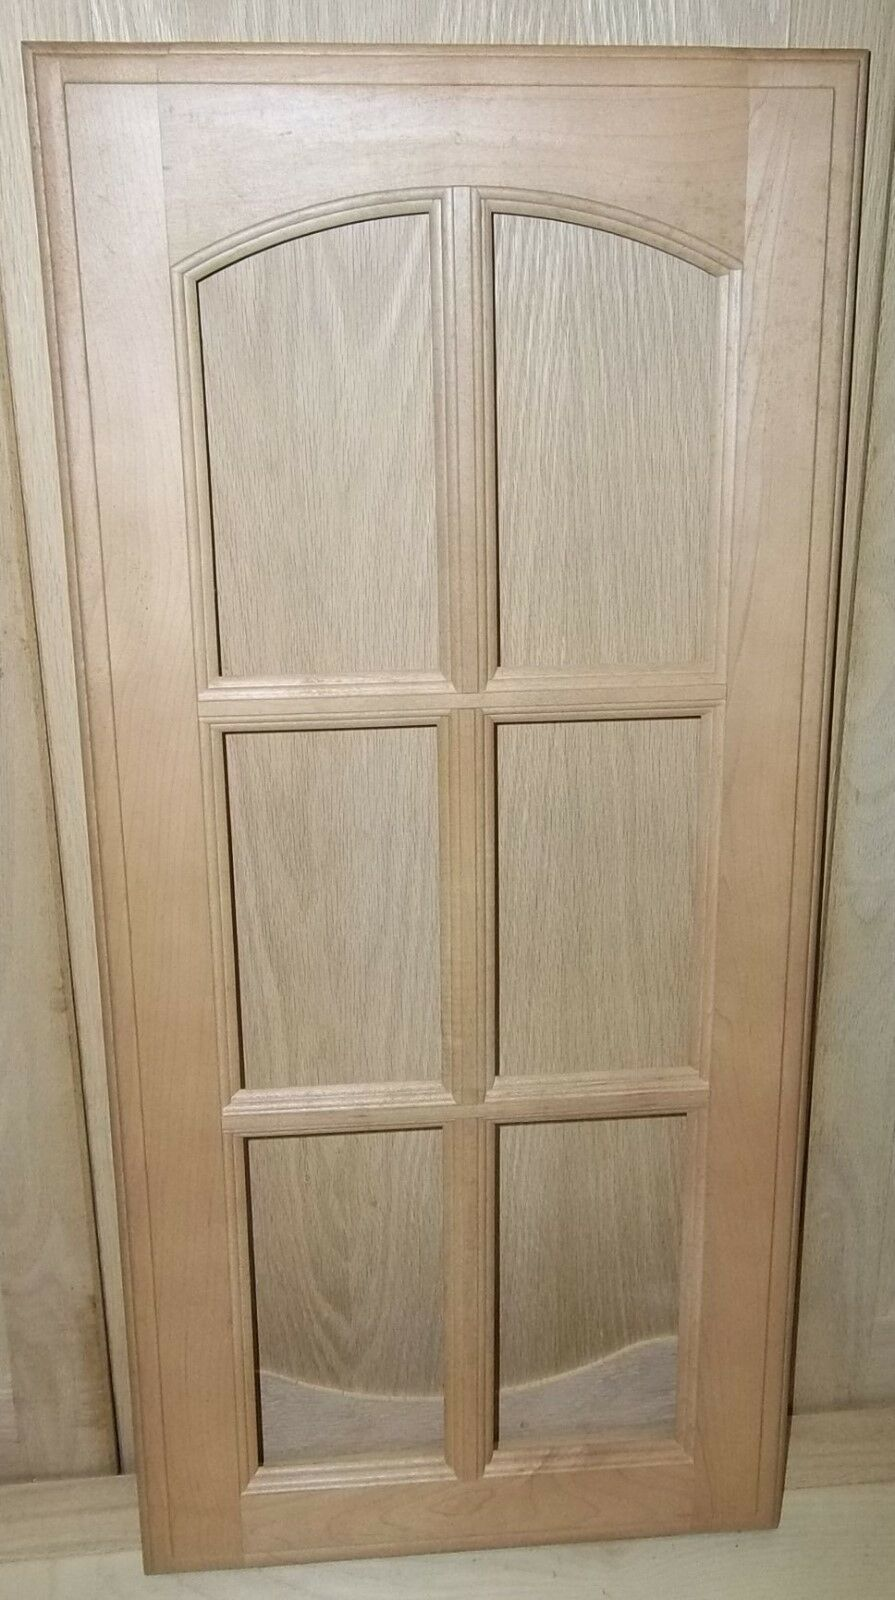 2 MULLION FRAME CABINET DOORS PAINT GRADE MAPLE EYEBROW 6 PANEL 13 3 4 X 28 3 4